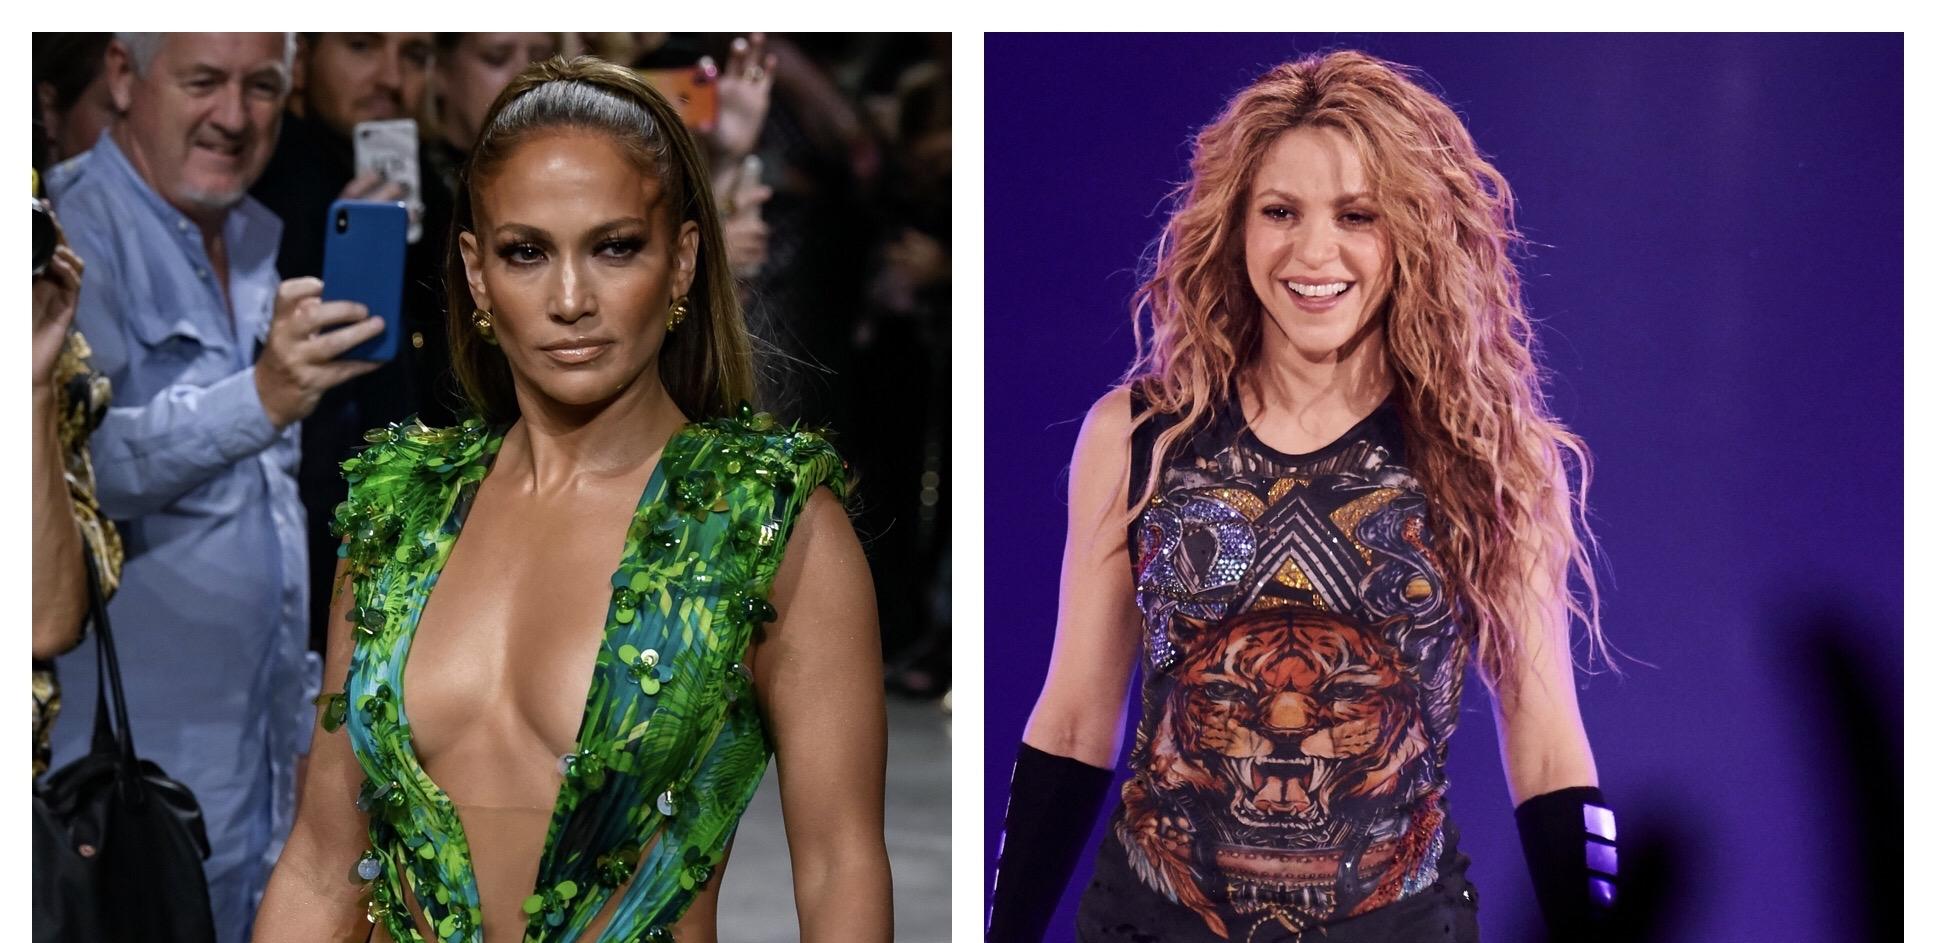 Jennifer Lopez Shakira To Perform At 2020 Super Bowl Halftime Show Wwd